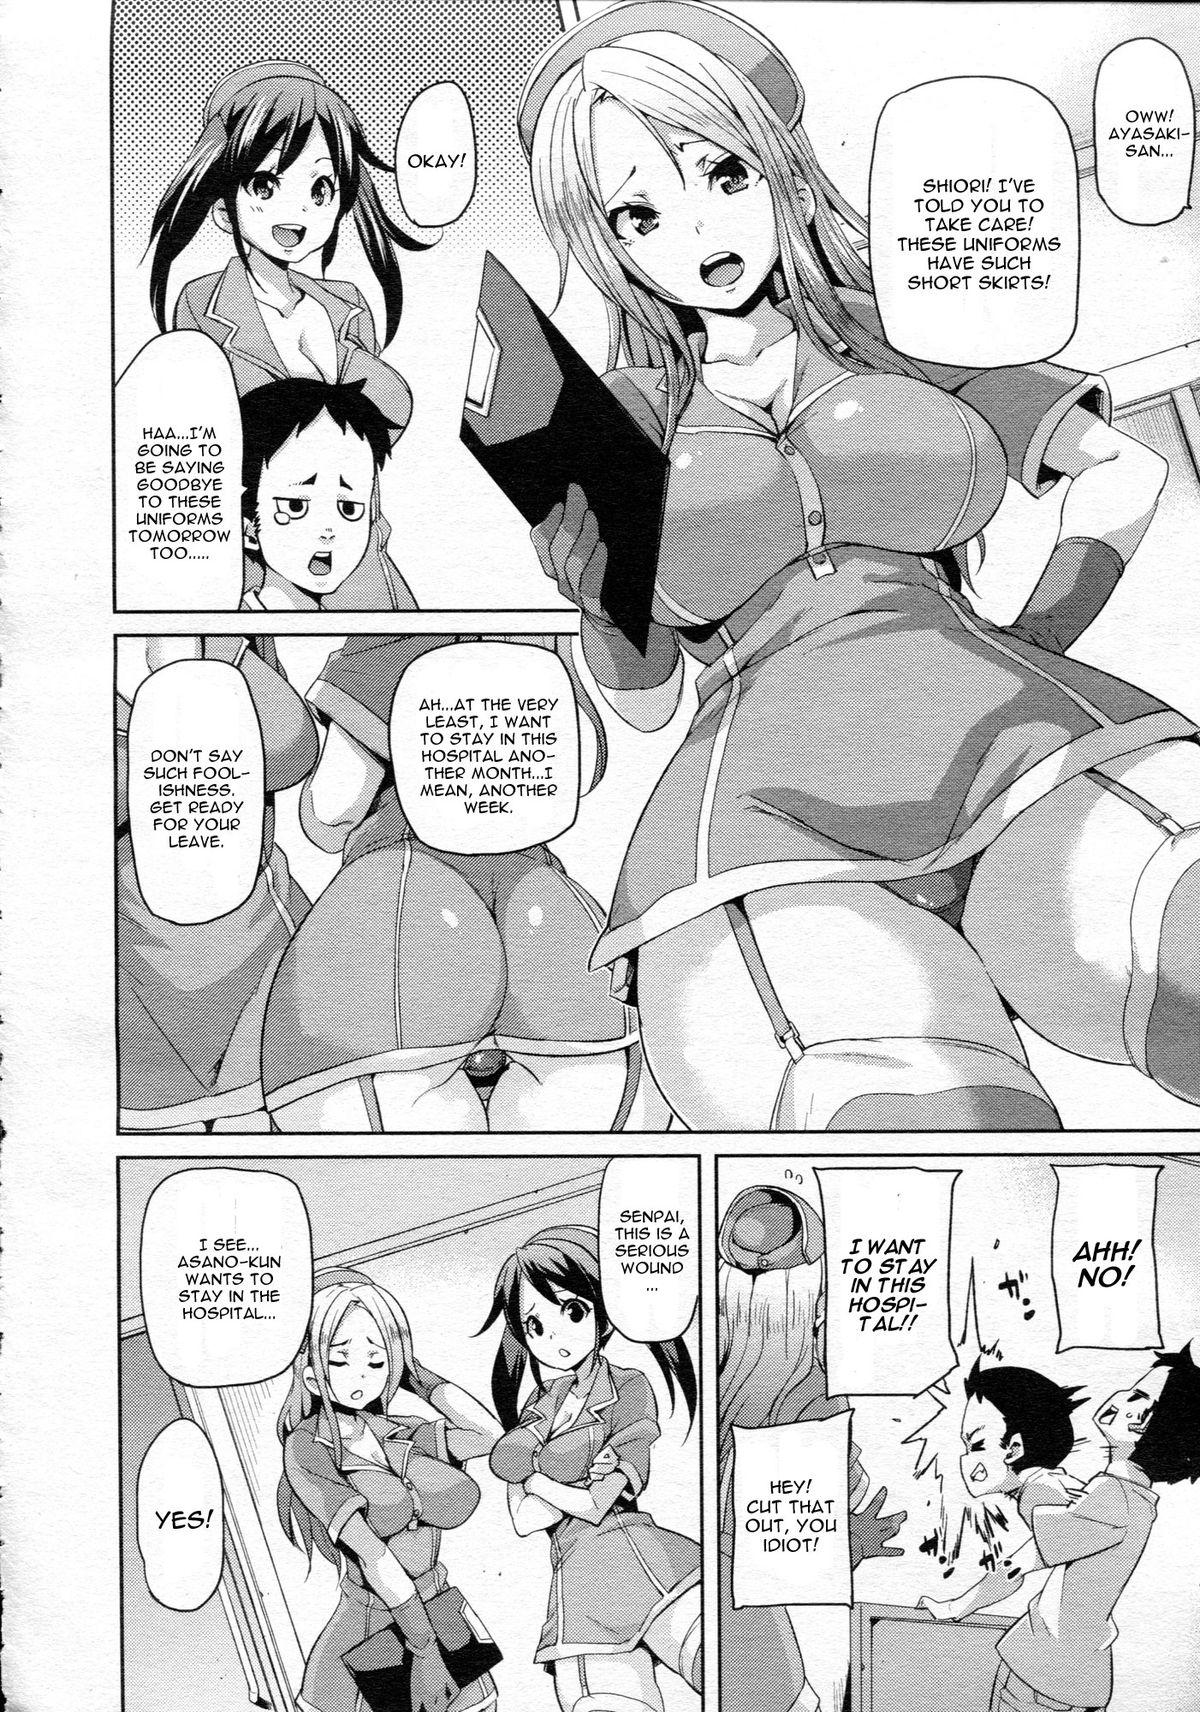 Iryouyou nara Daijoubu   If It's For Medical Use, Then It's Okay! 1